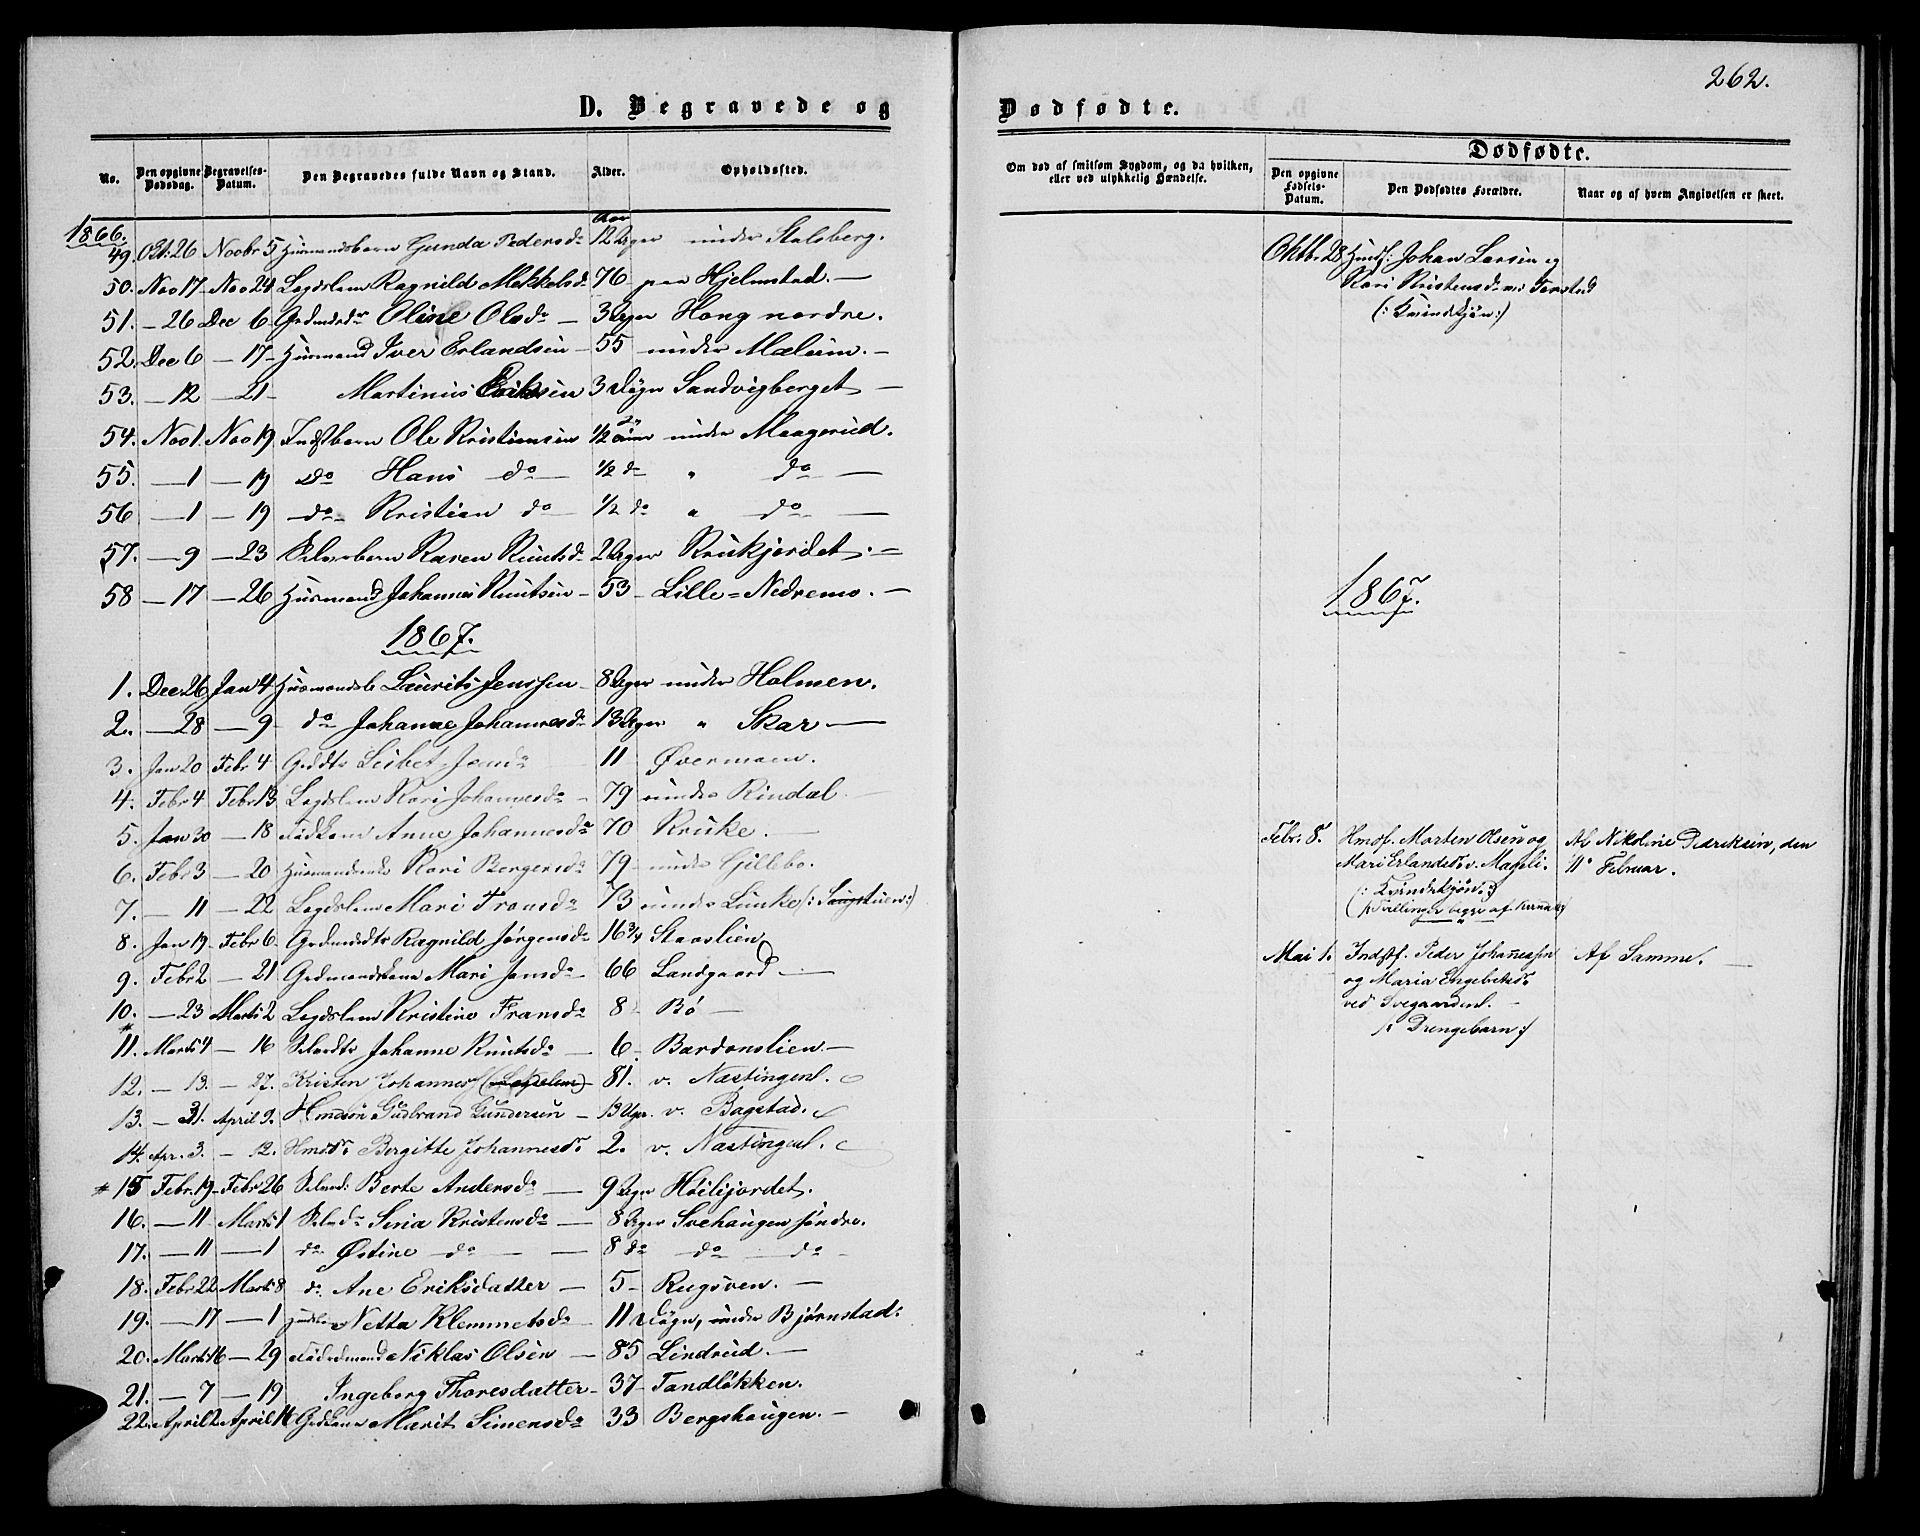 SAH, Øyer prestekontor, Klokkerbok nr. 1, 1863-1877, s. 262